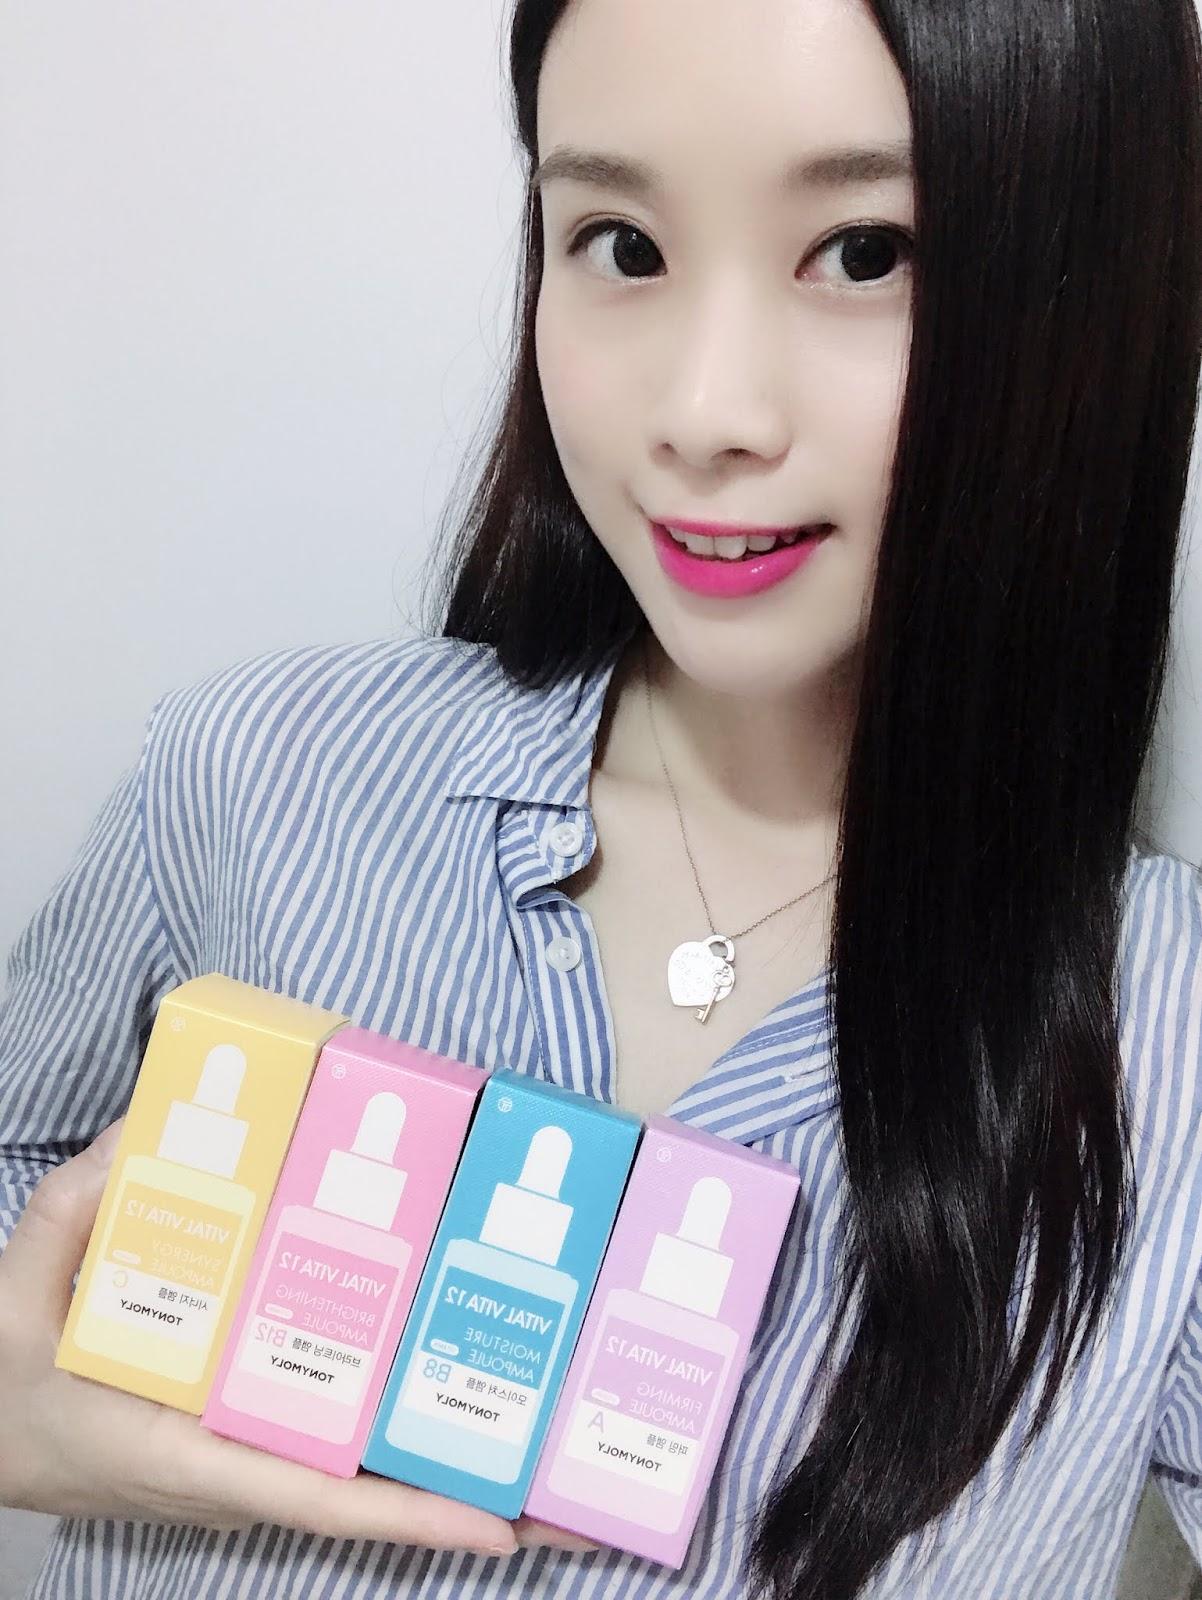 Beautylife HK - ◕◡◕達至五種美肌功效♥TONYMOLY VITAL